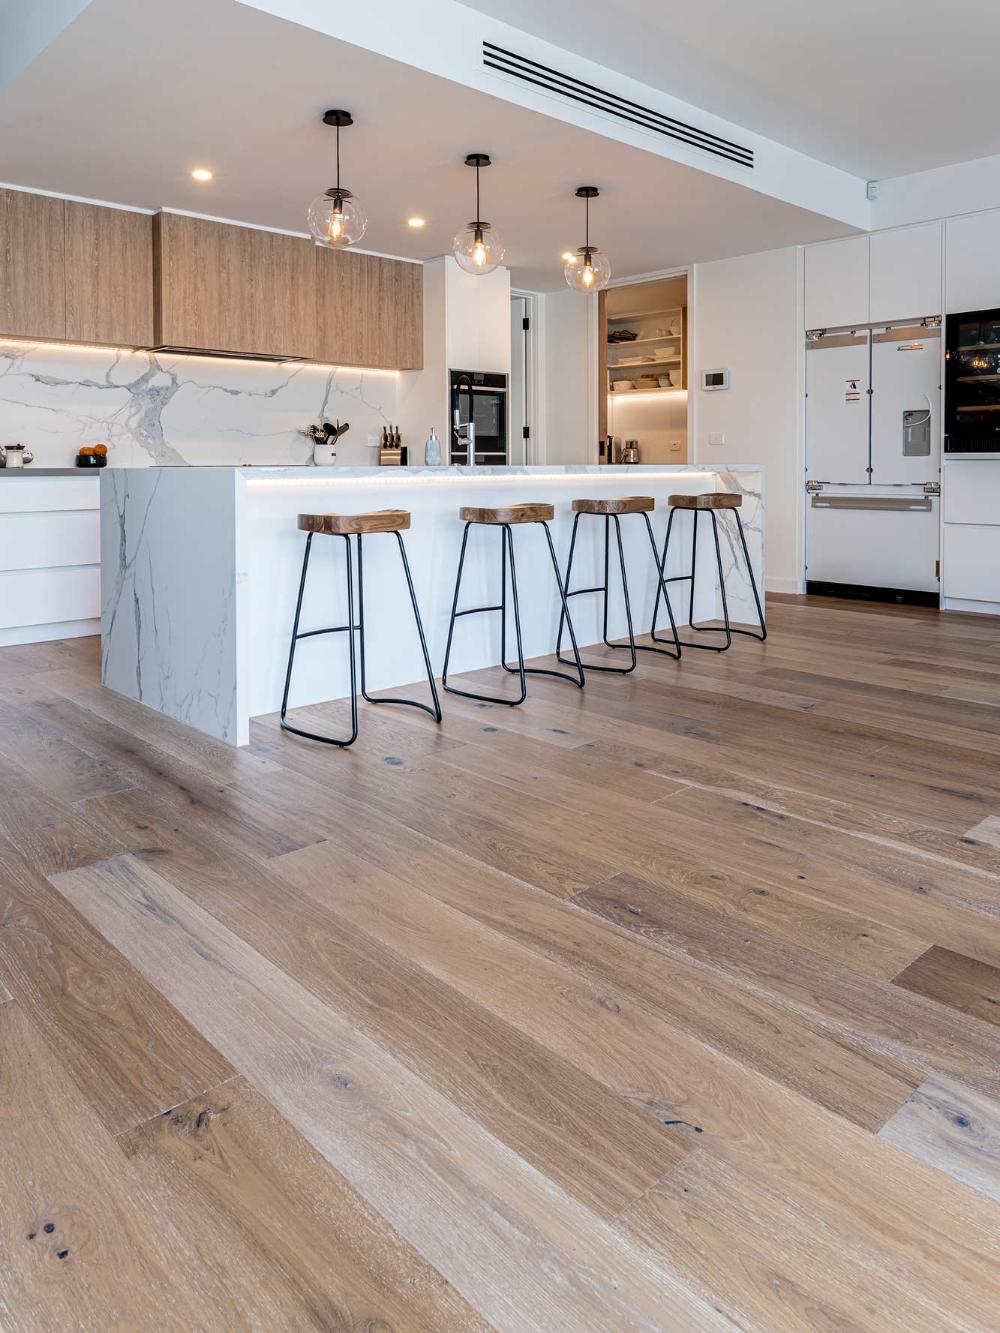 Wooden Floorboards Flooring Melbourne ...   Timber kitchen, Wooden ...